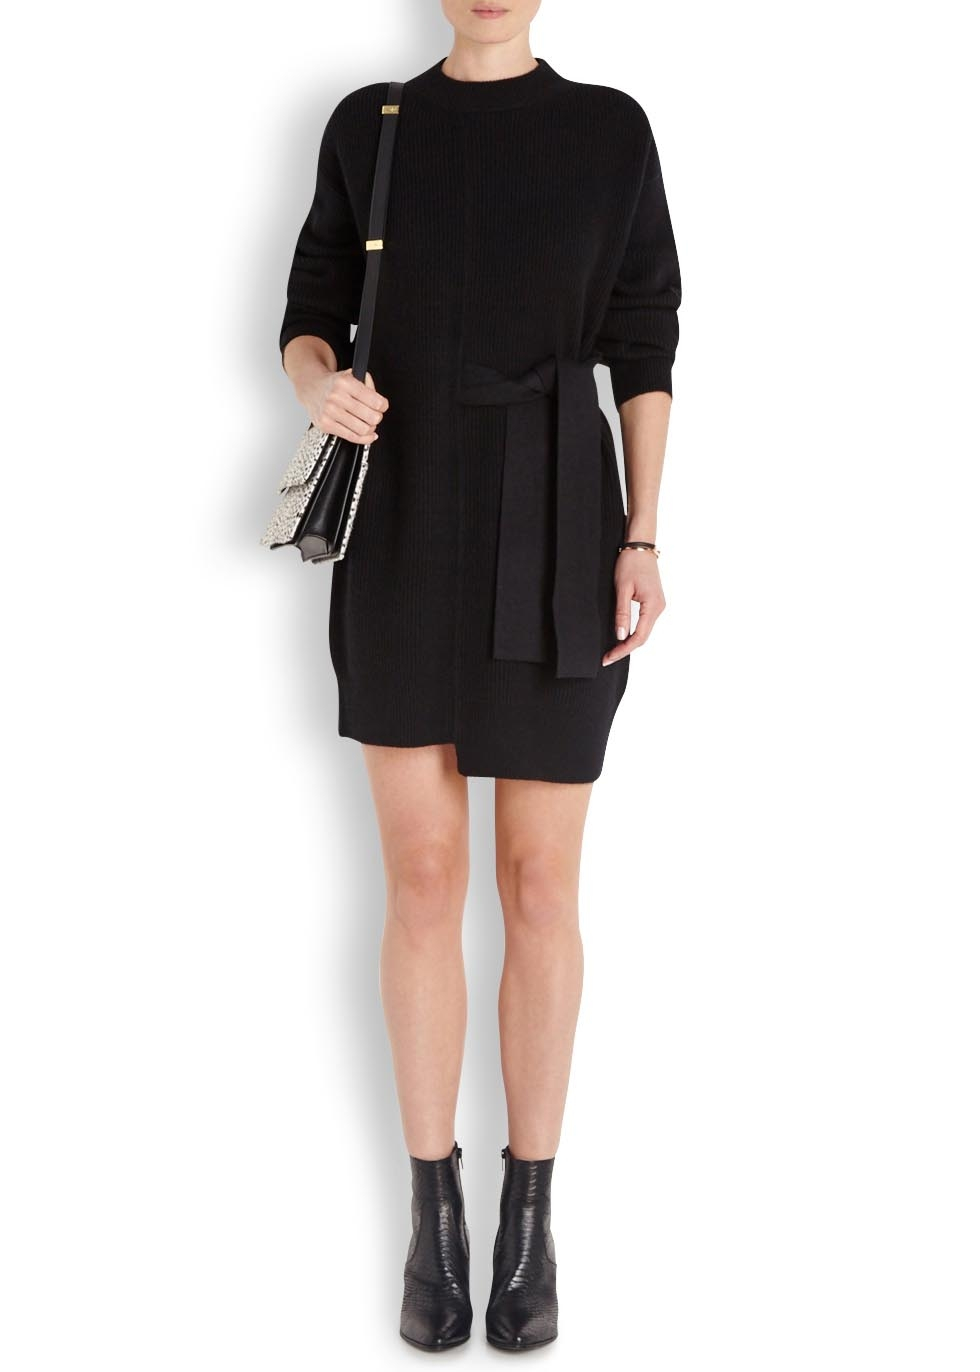 Belted Wool-Blend Midi Dress Proenza Schouler Cheap Sale 2018 Unisex ezE9q4jXNv